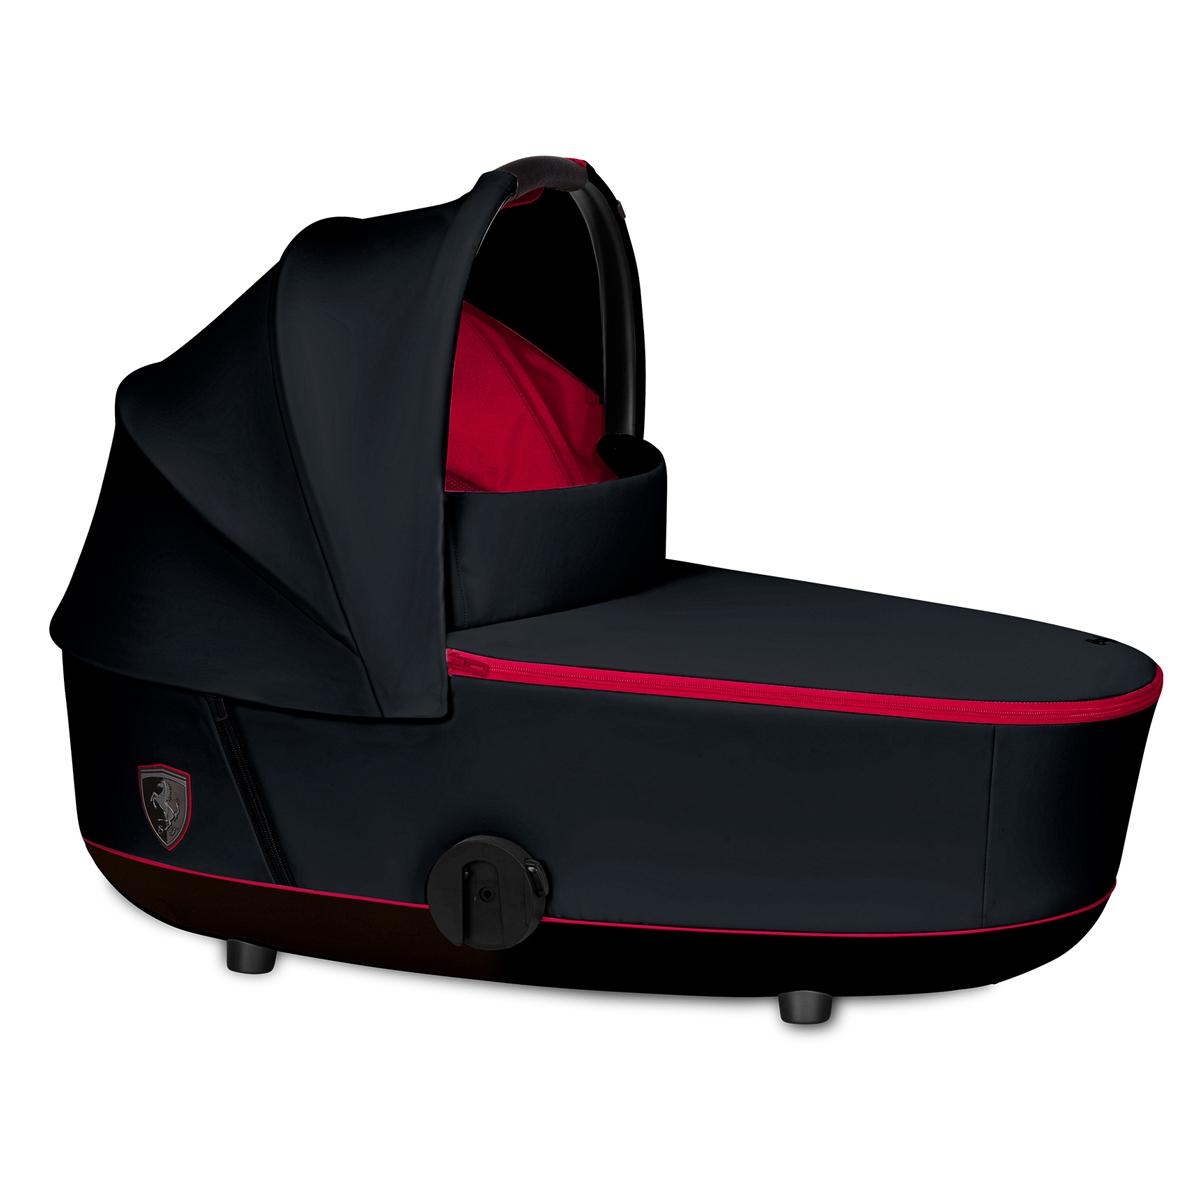 Nacelle Nacelle de Luxe Mios Scuderia Ferrari - Victory Black